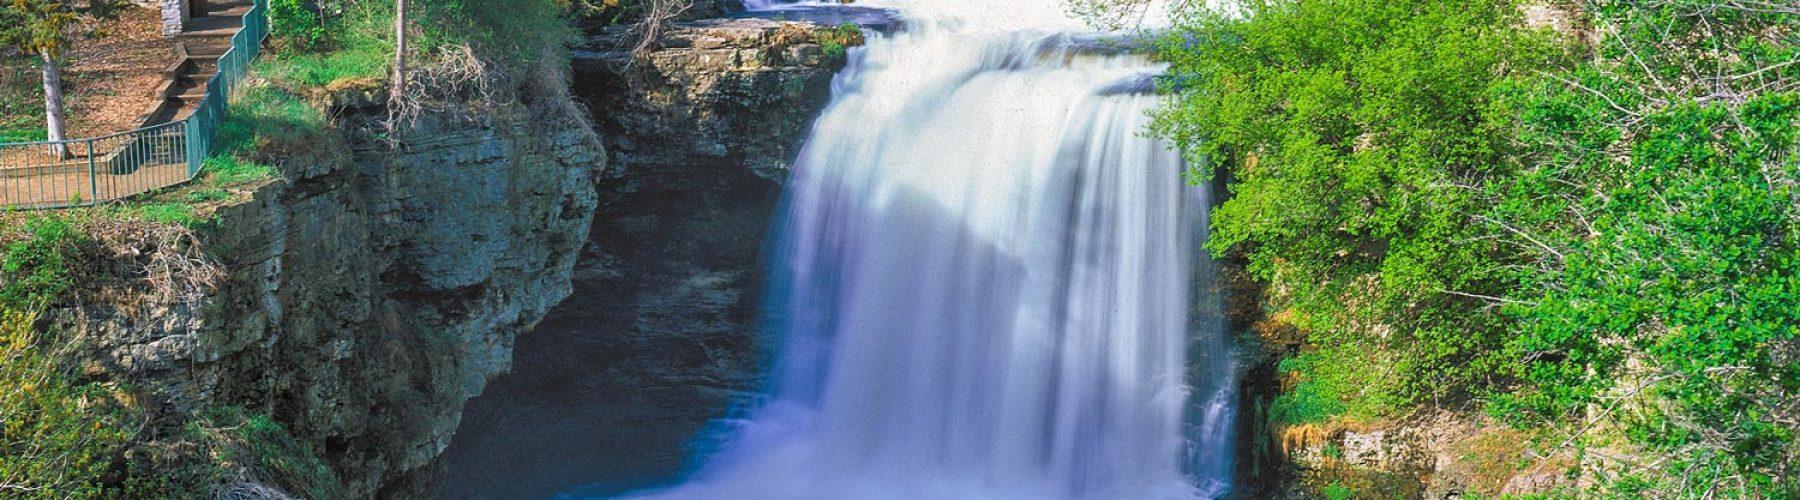 vermillion-falls